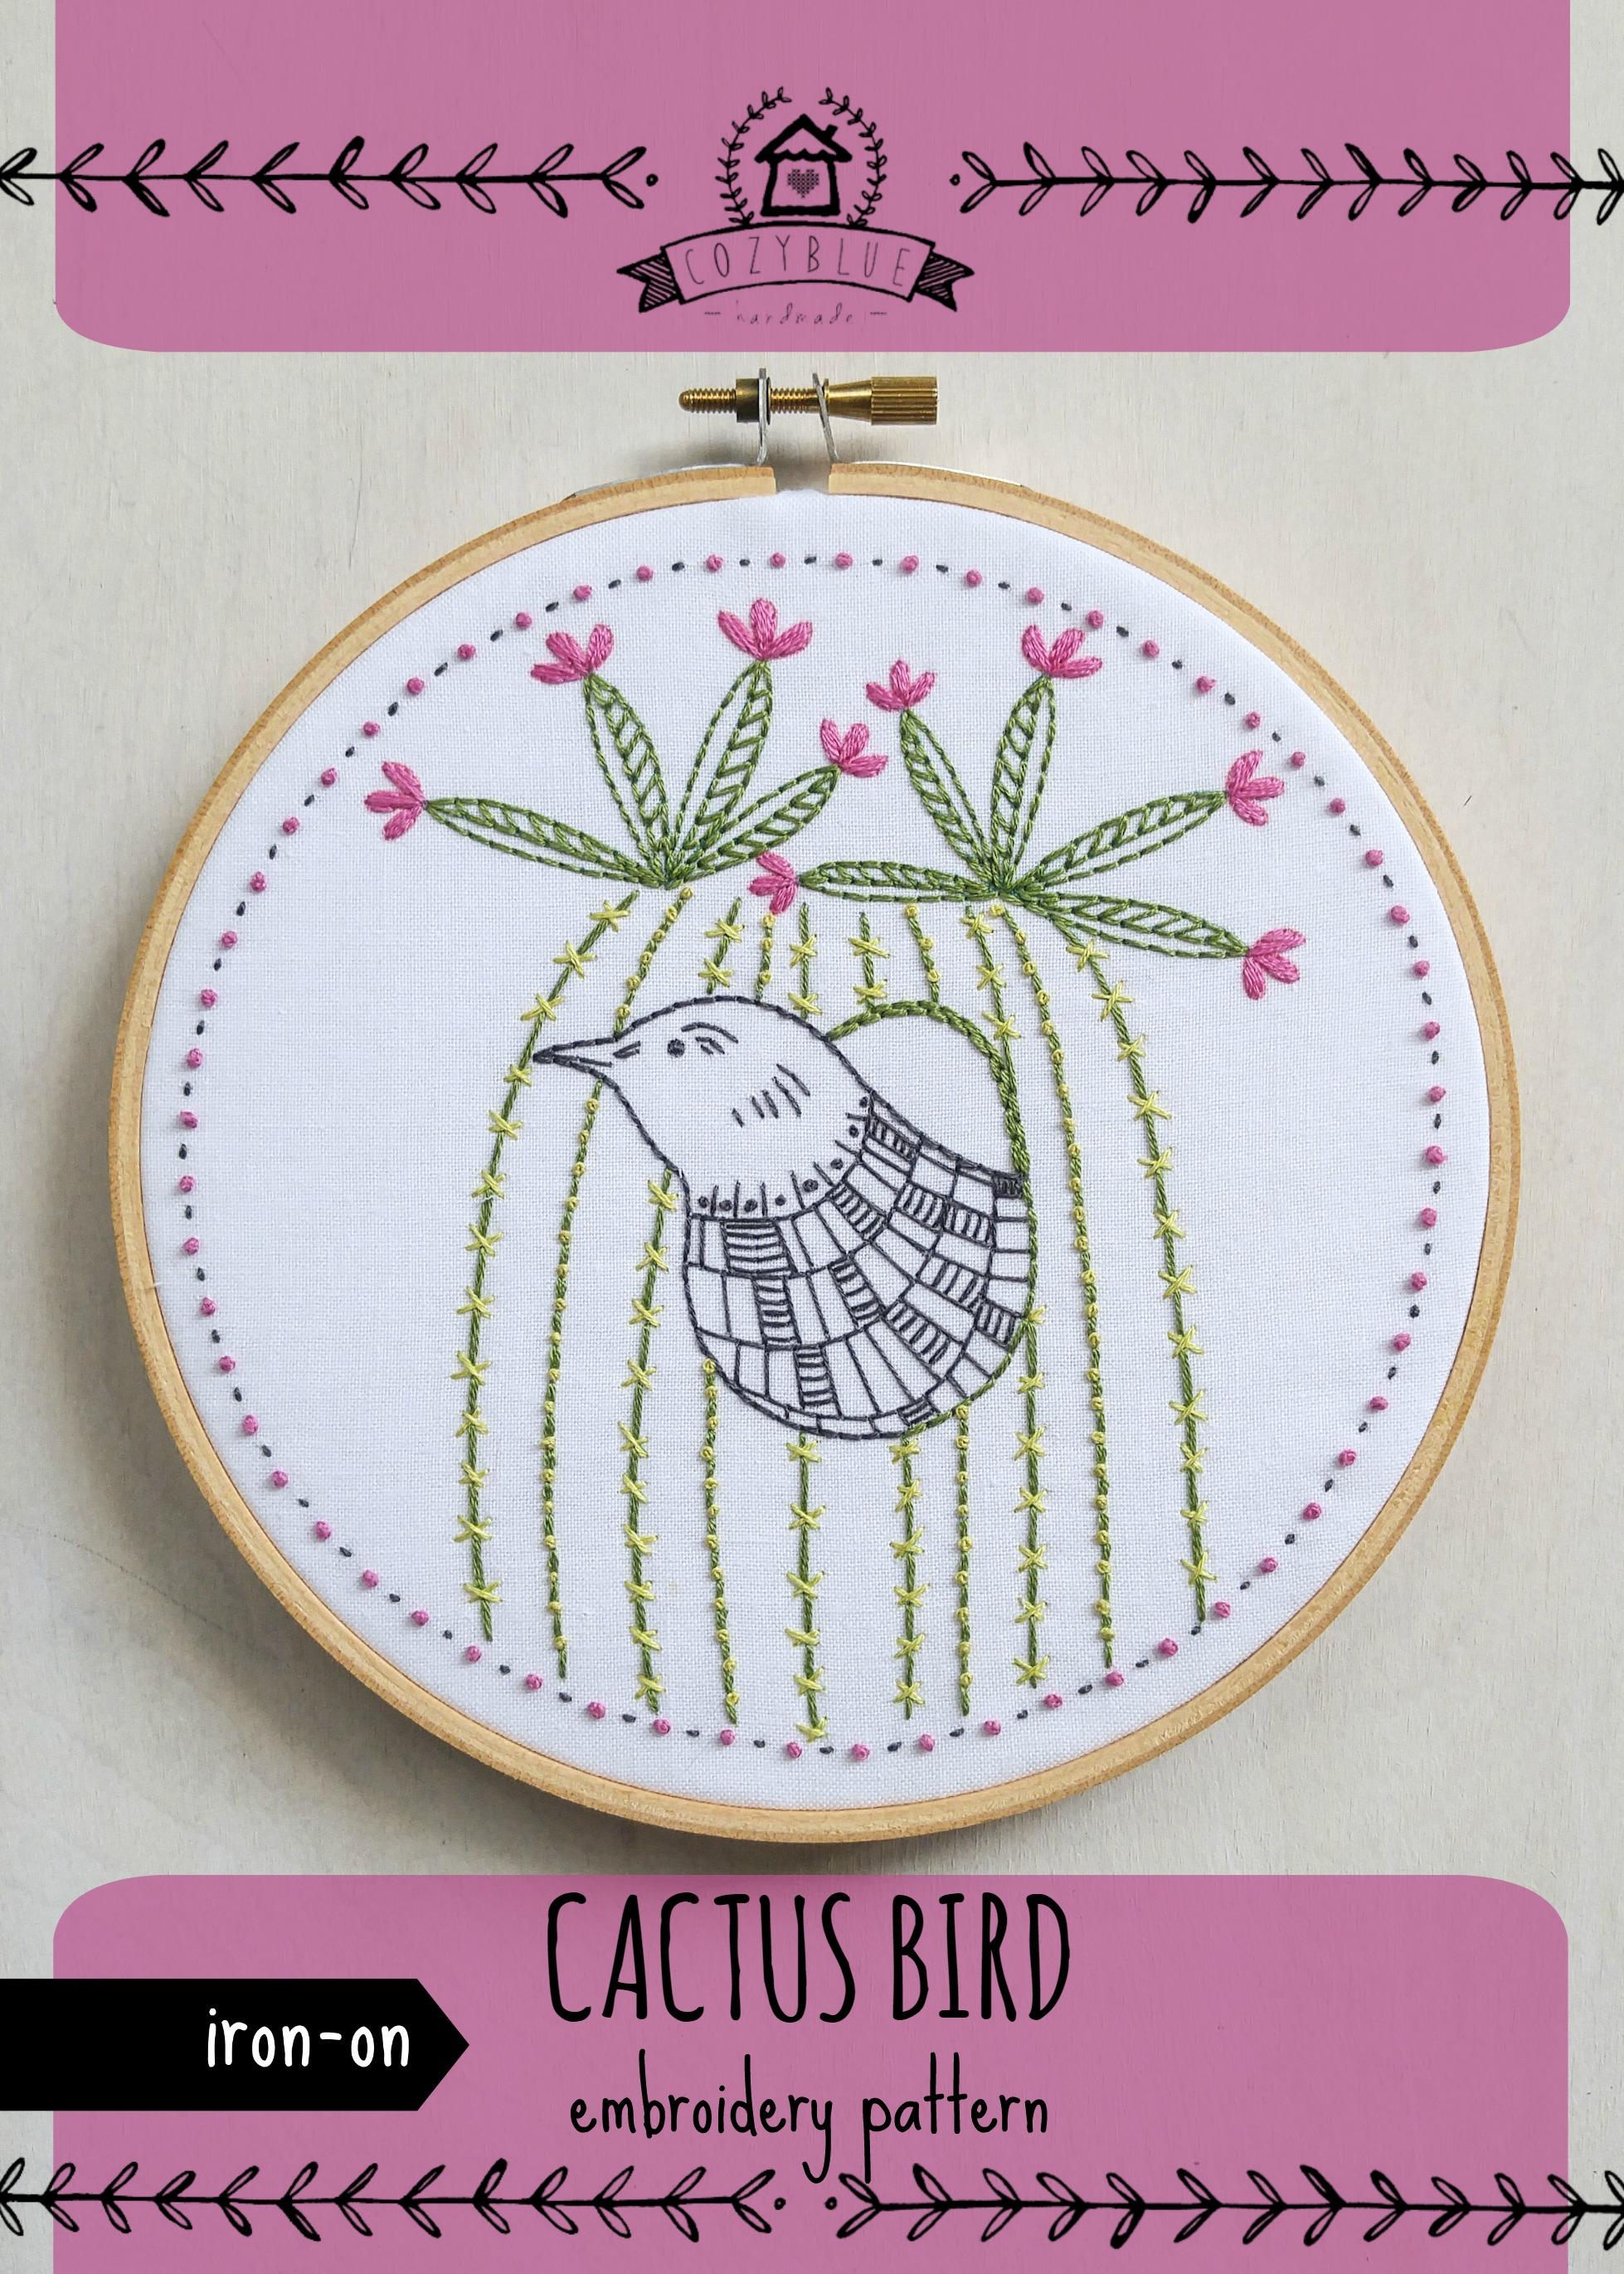 cactus bird iop cover 5x7.jpg